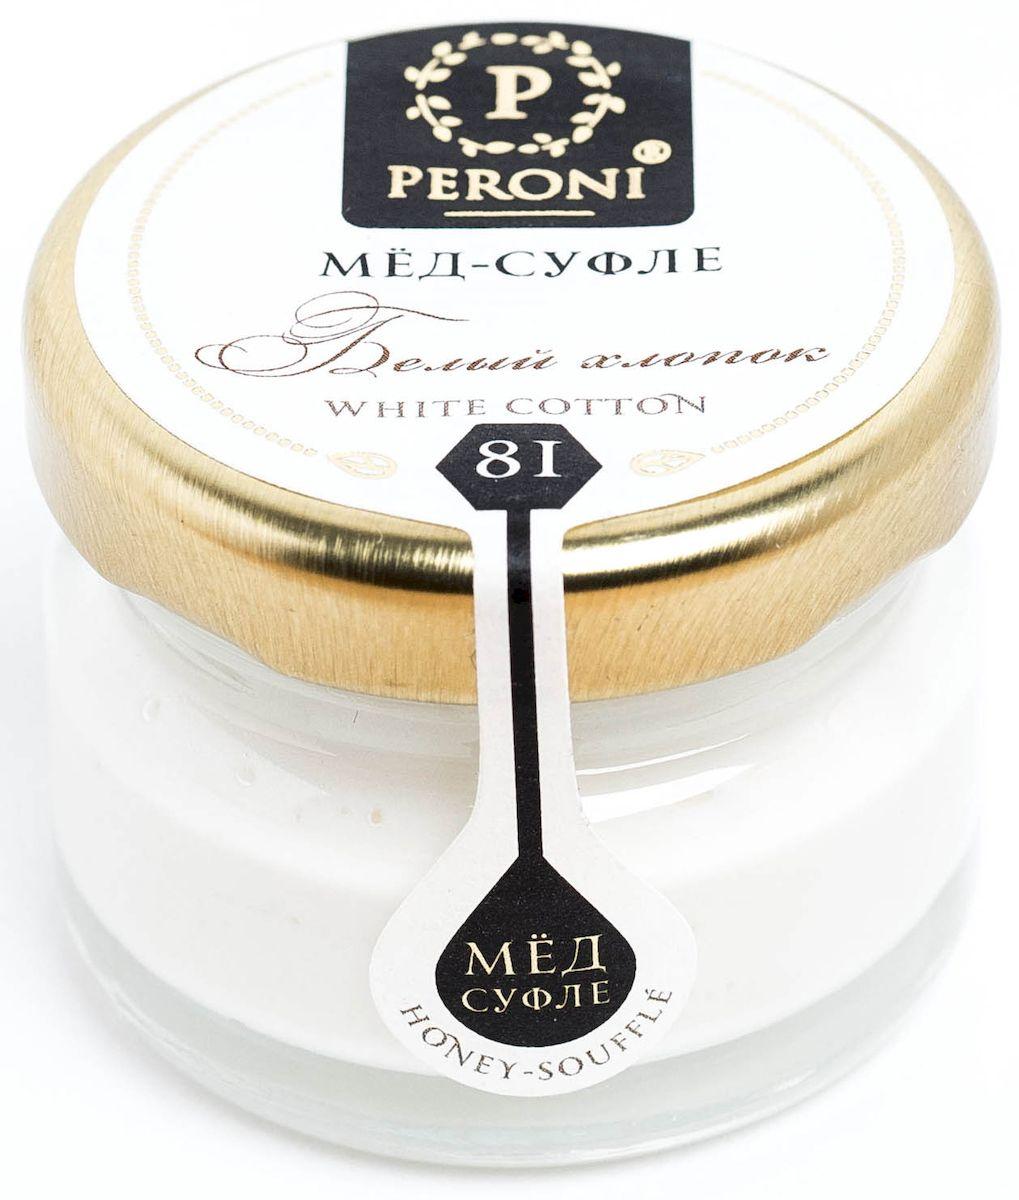 Peroni Белый хлопок мед-суфле, 30 г peroni молочный цветок мед суфле 30 г